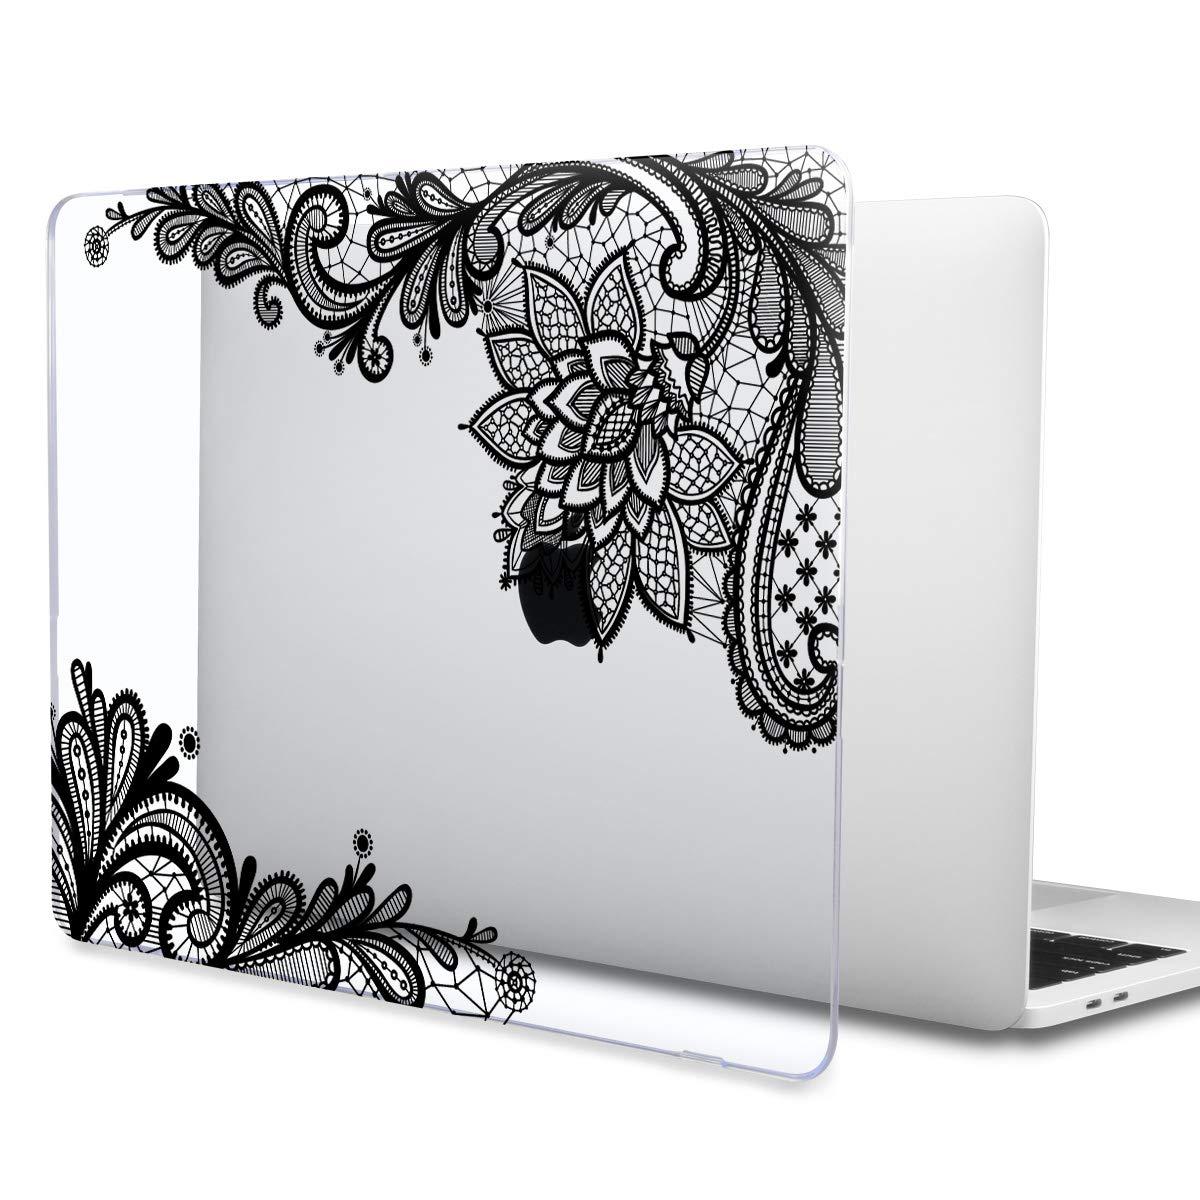 TwoL Funda Dura Carcasa para MacBook Air 13 Pulgadas 2018 Modelo A1932 Retina Creative Lampe